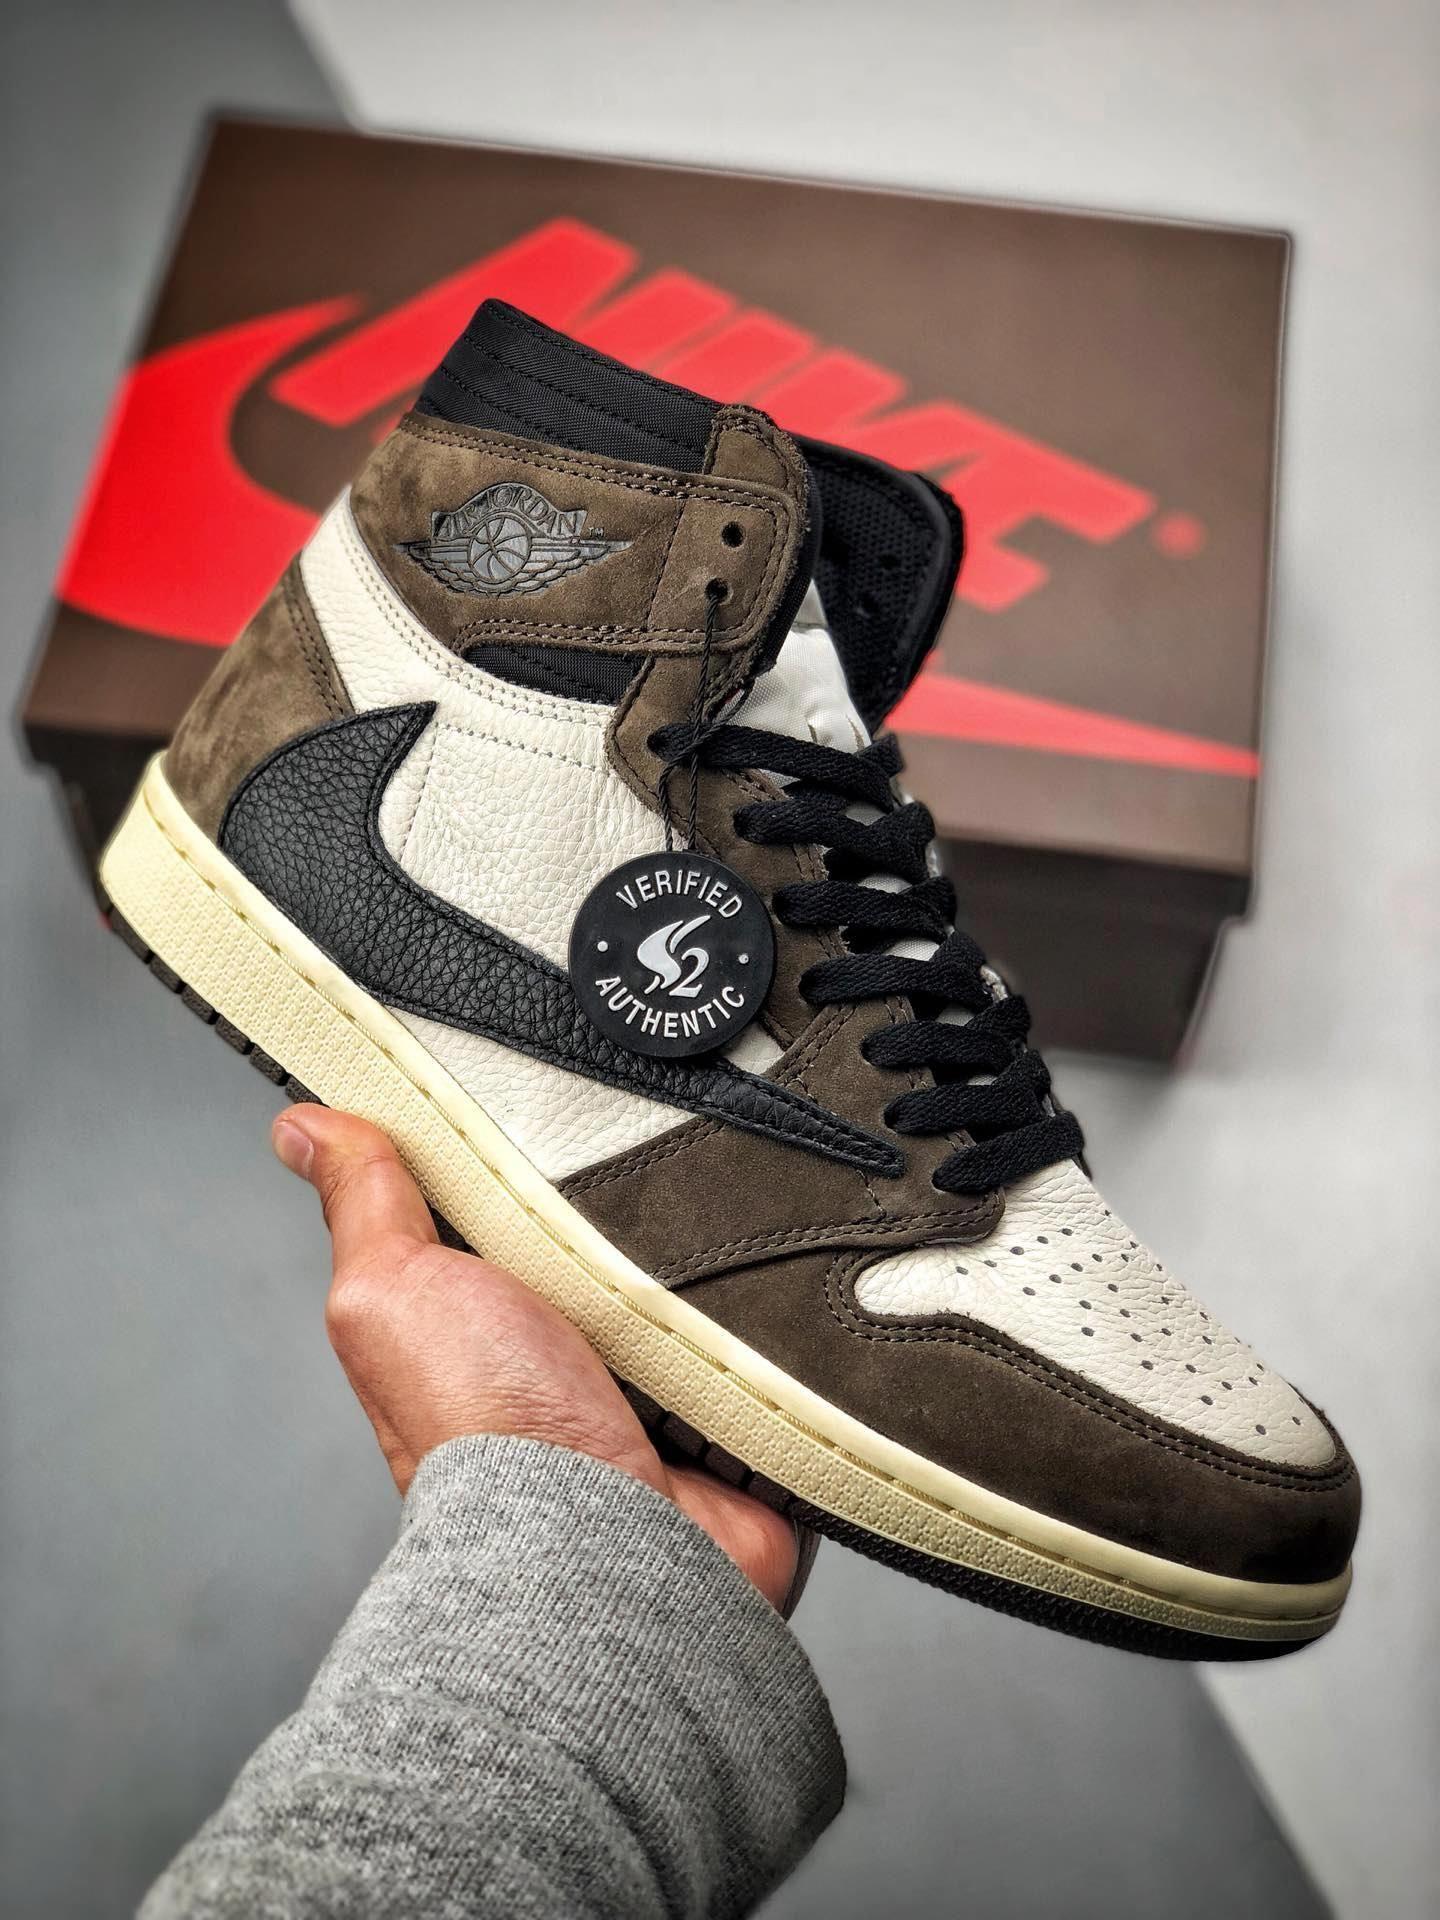 Travis Scott x NIKE Air Jordan 1 AJ1